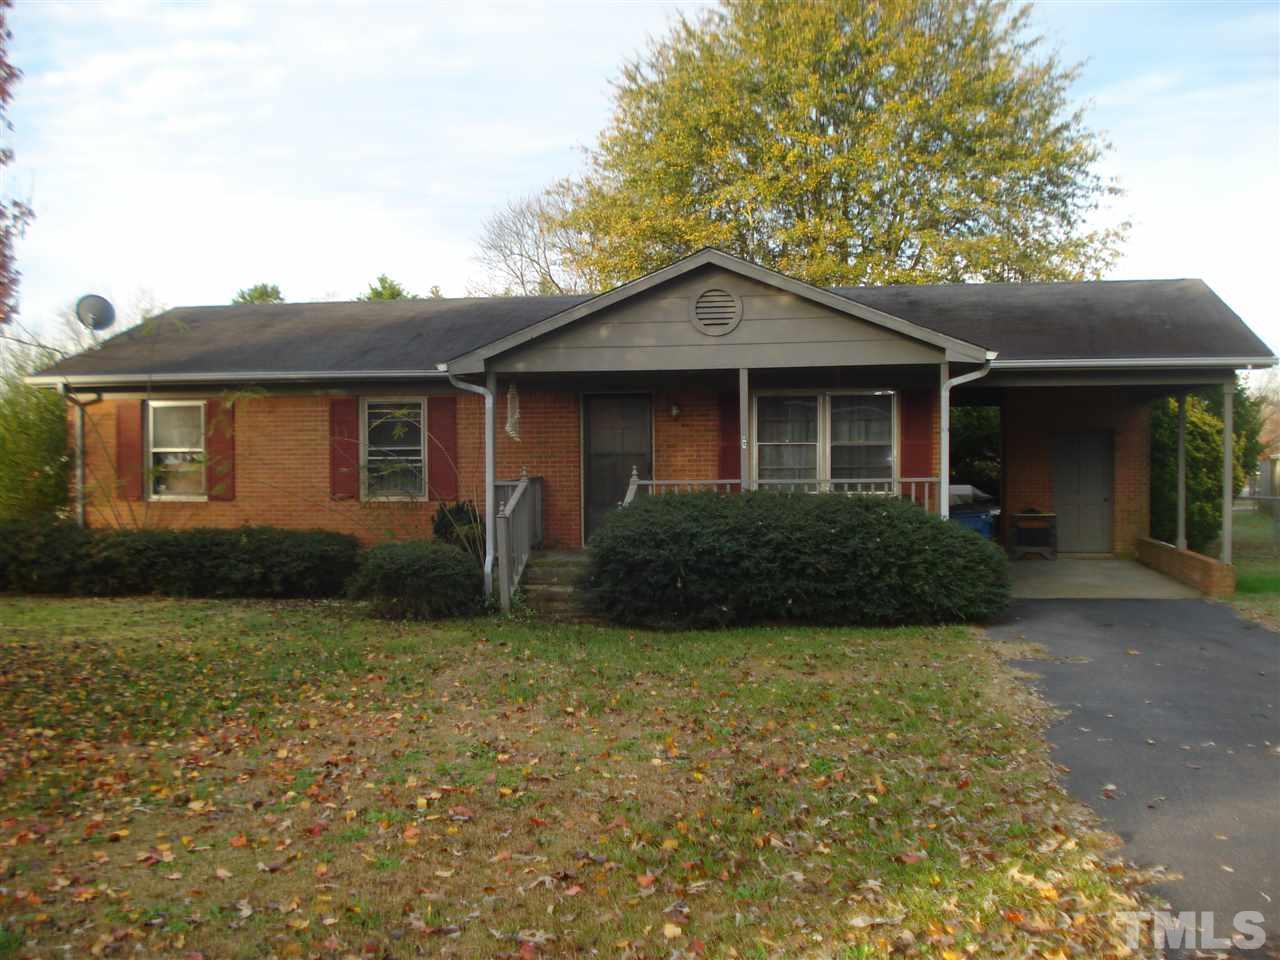 803 Warren Rd, Erwin, NC